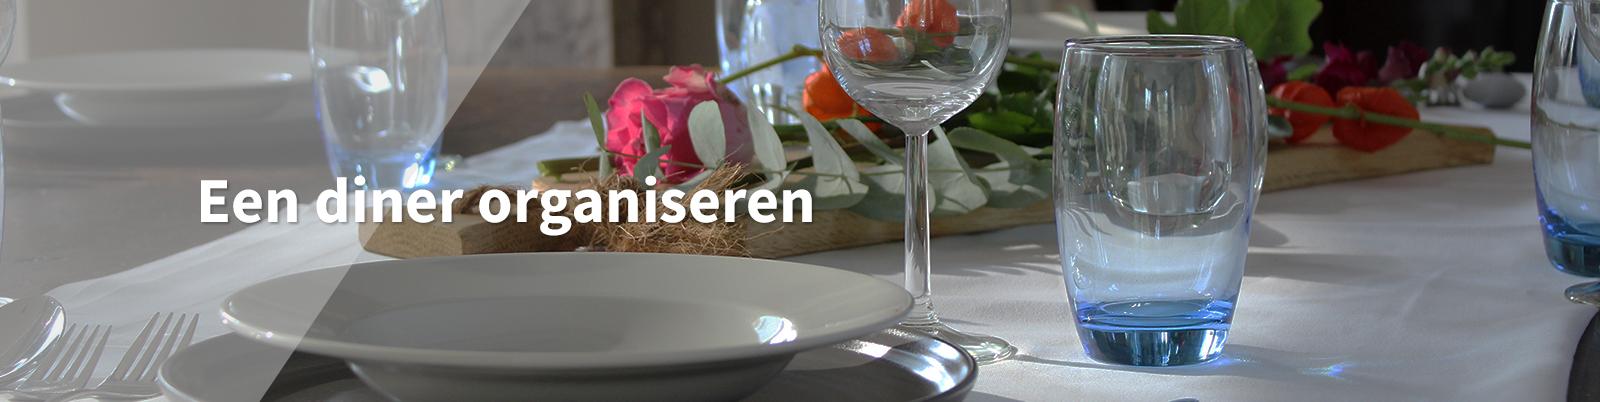 Diner thuis organiseren